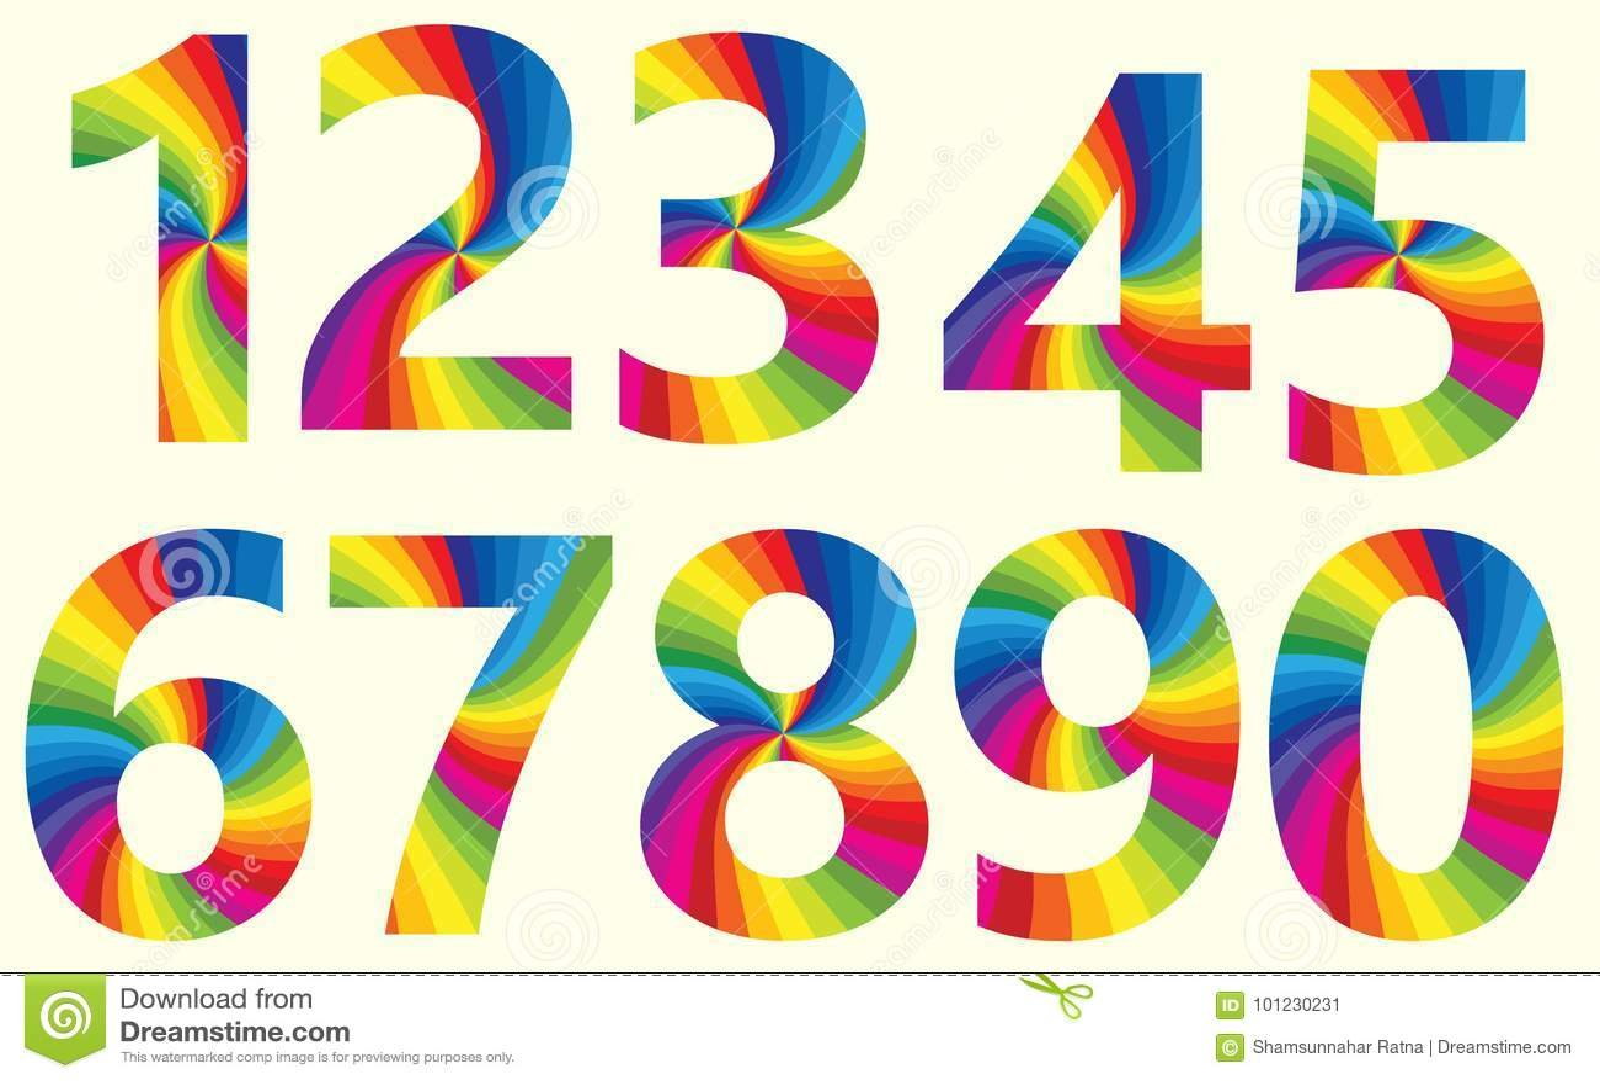 Stylish Rainbow Number 1 To 10 Stock Vector